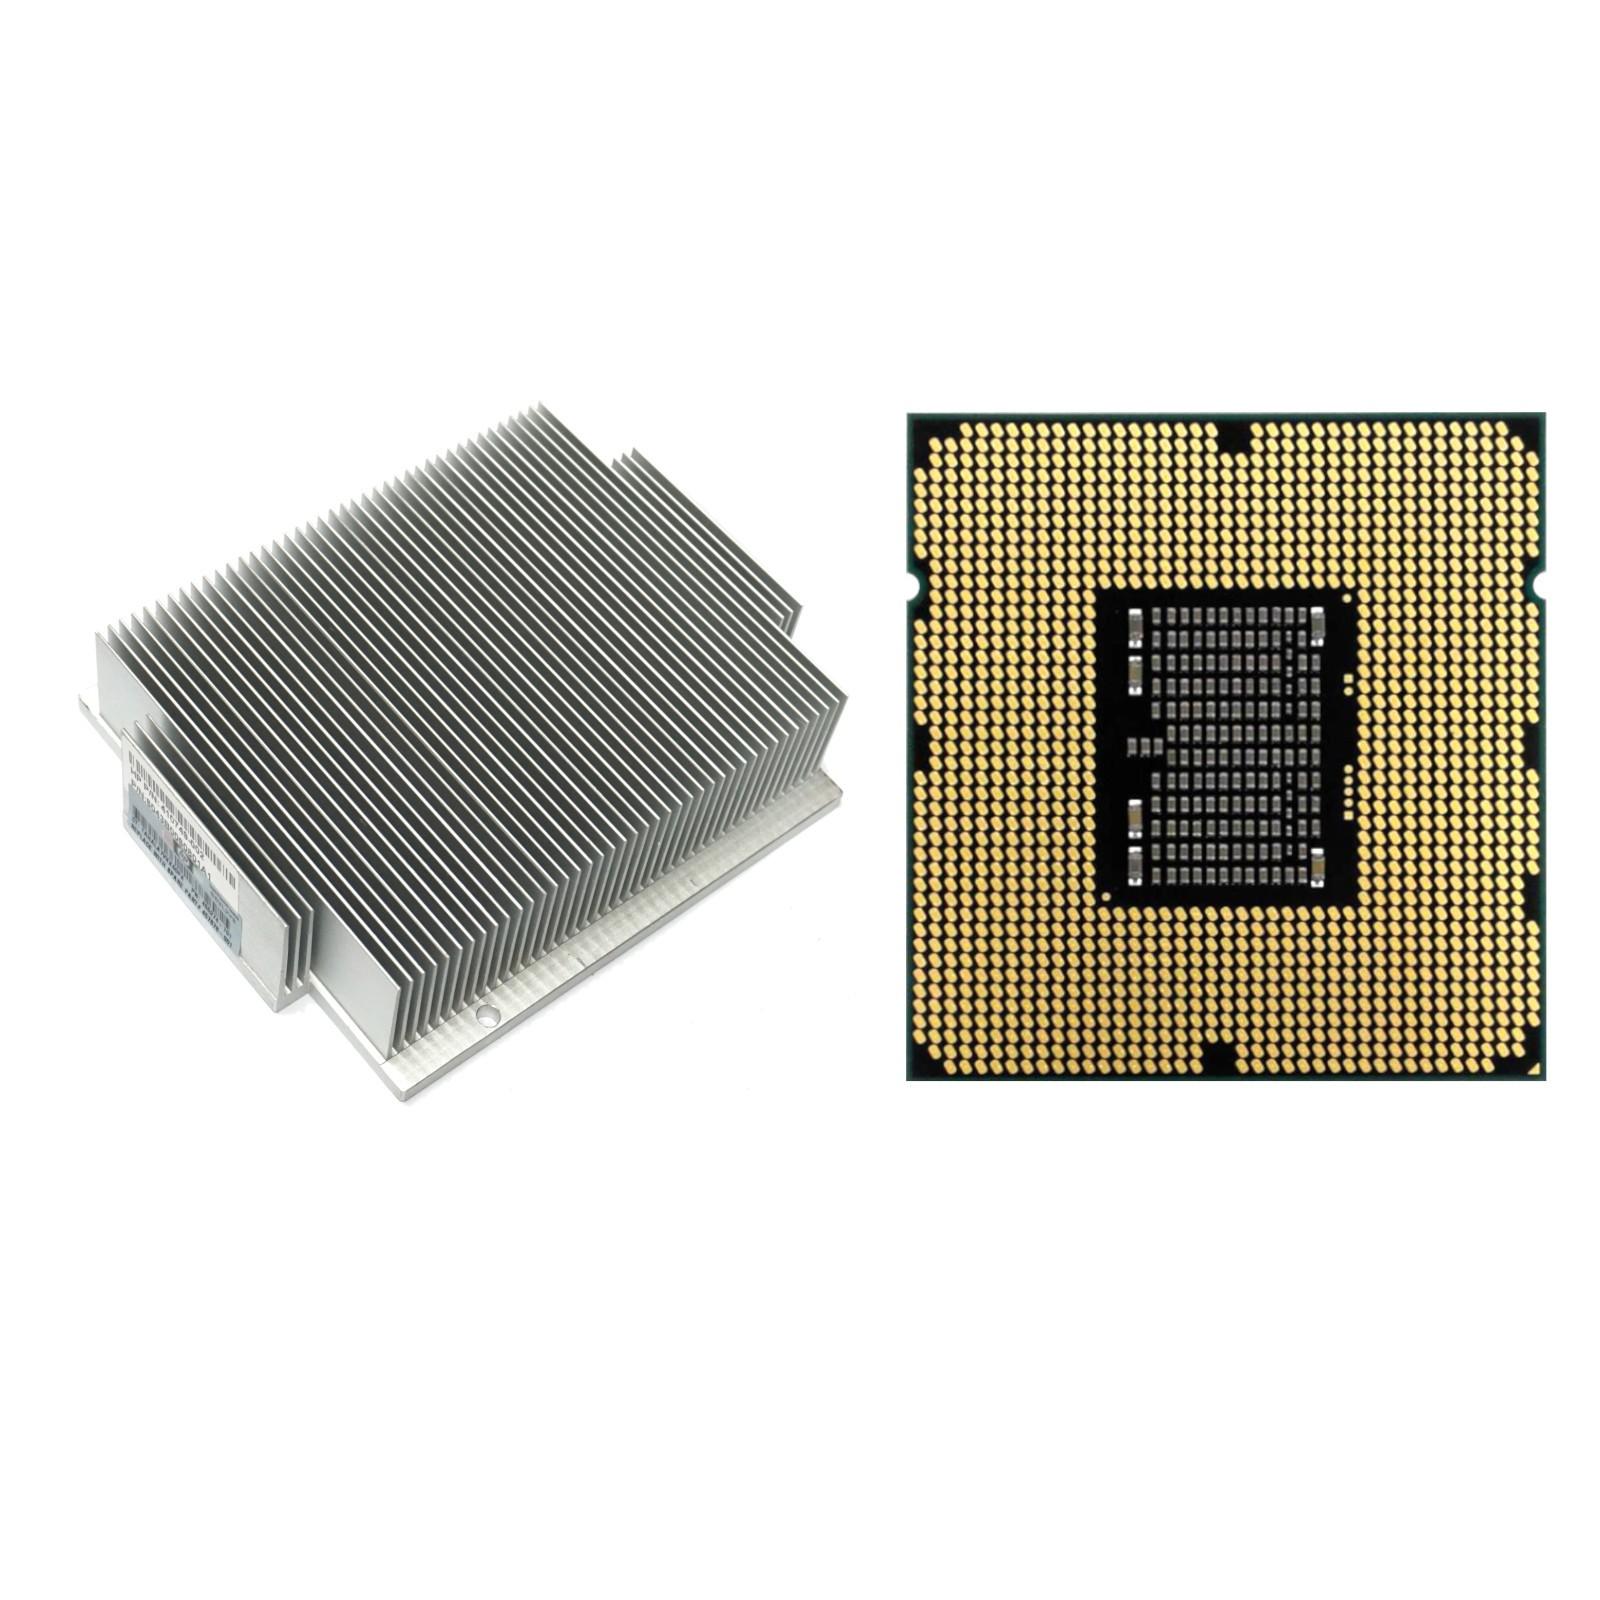 HP (457931-B21) ProLiant DL360 G5 - Intel Xeon E5450 CPU2 Kit